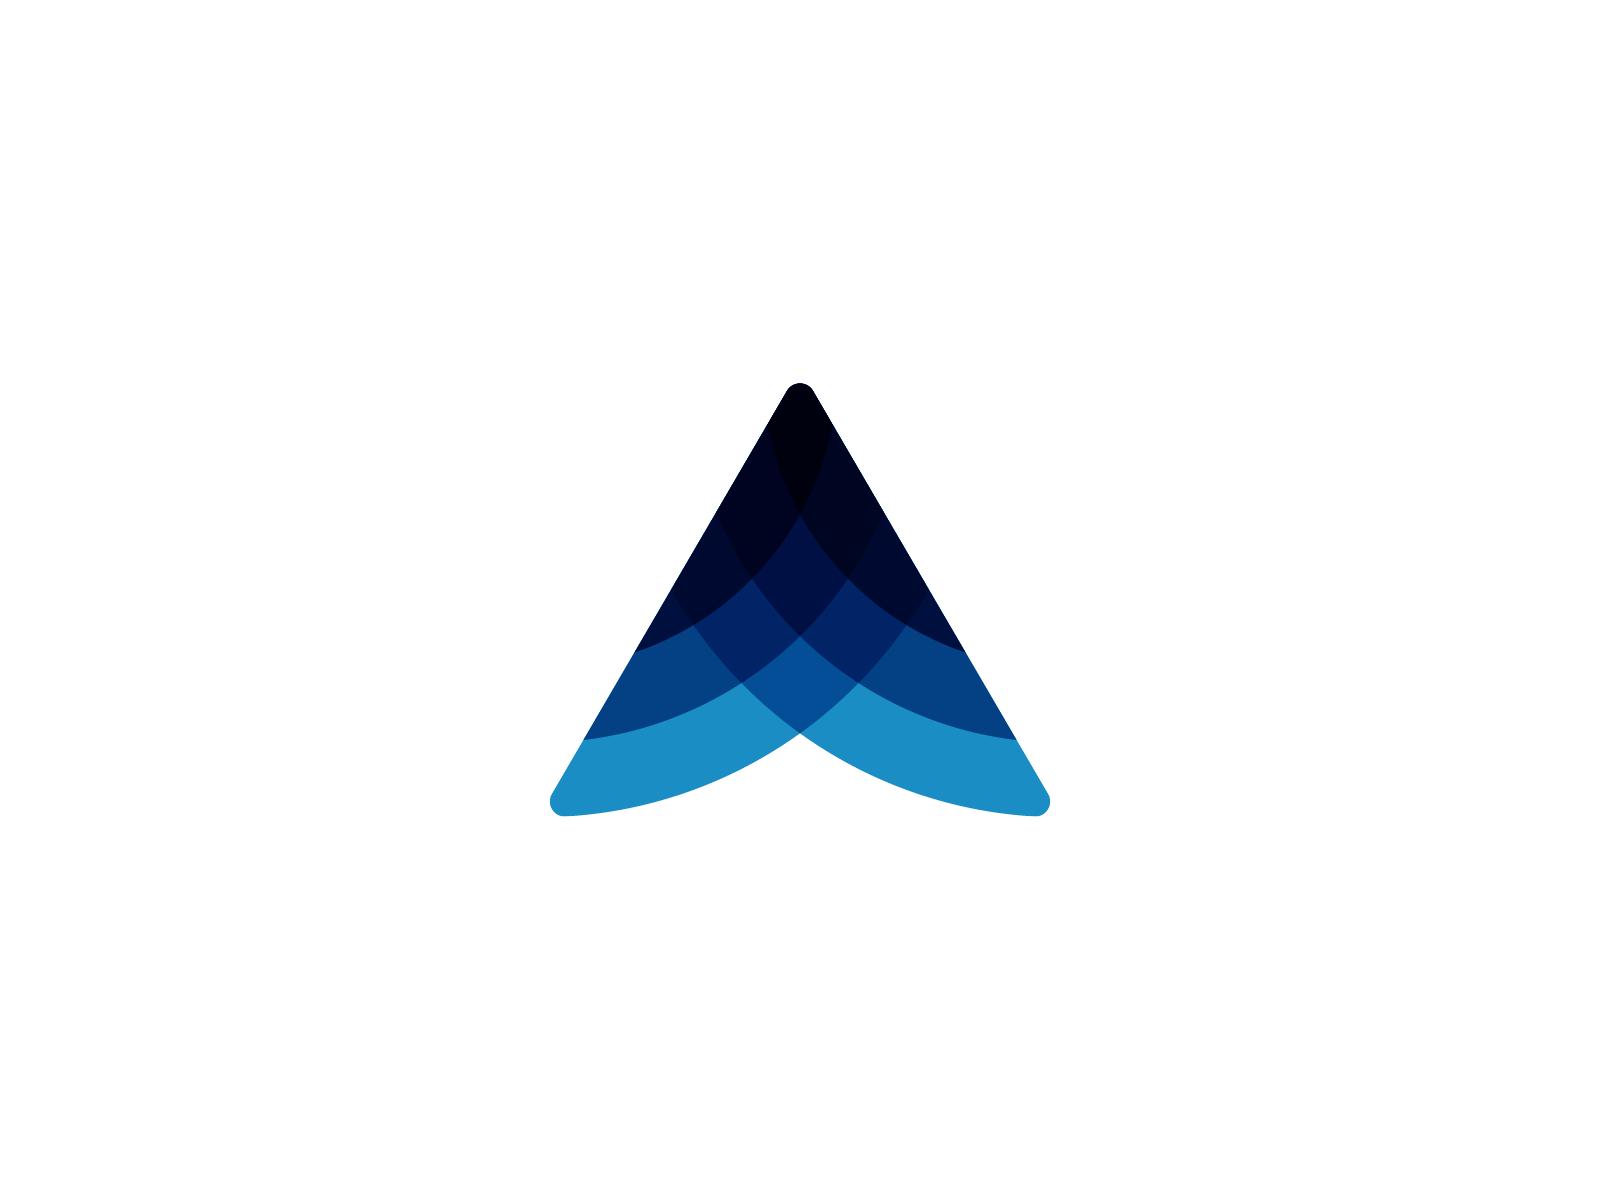 Arrow 4x